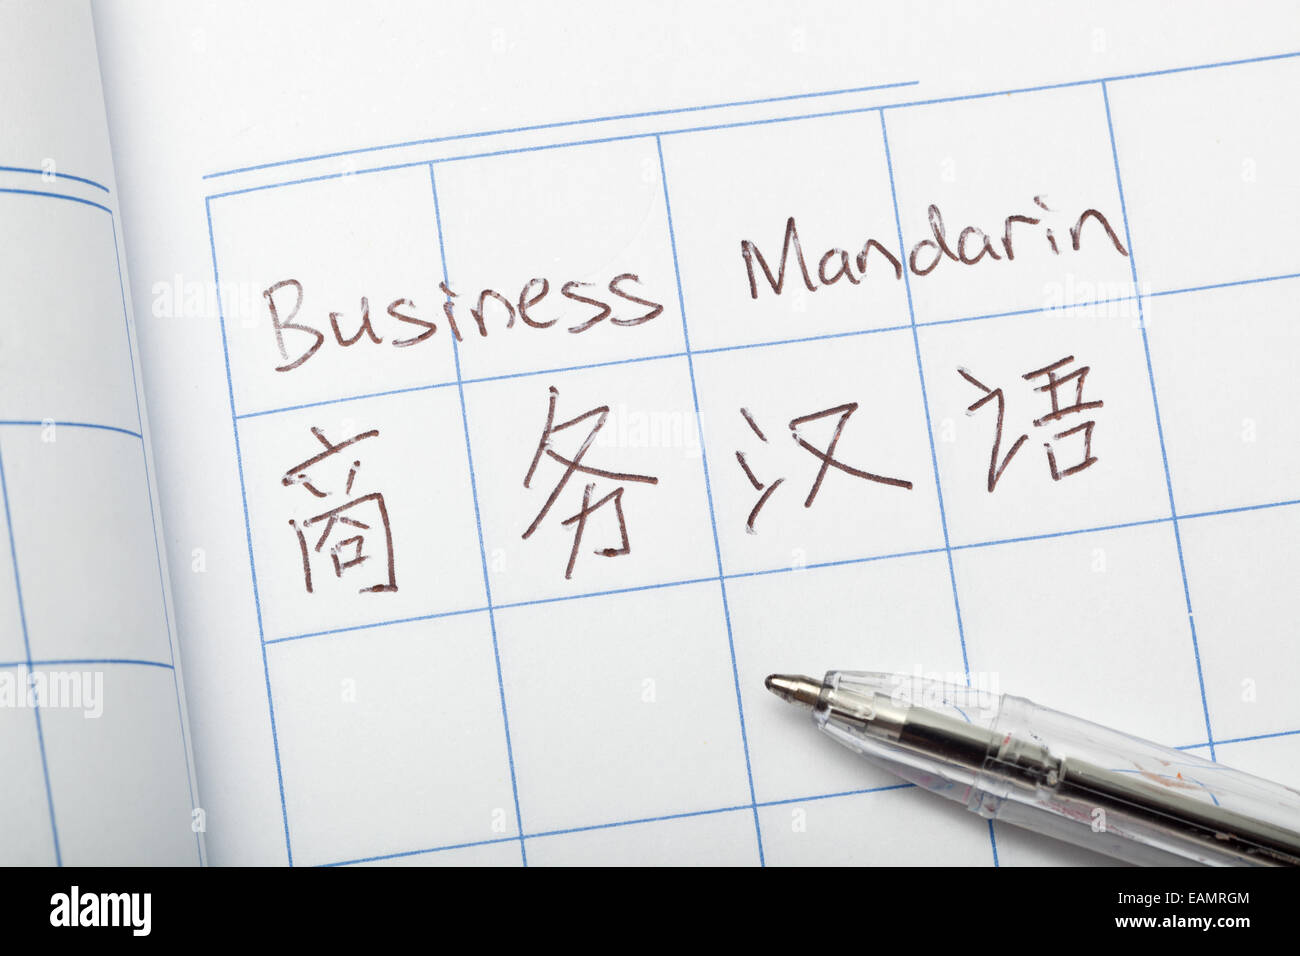 Translate Stock Photos & Translate Stock Images - Alamy